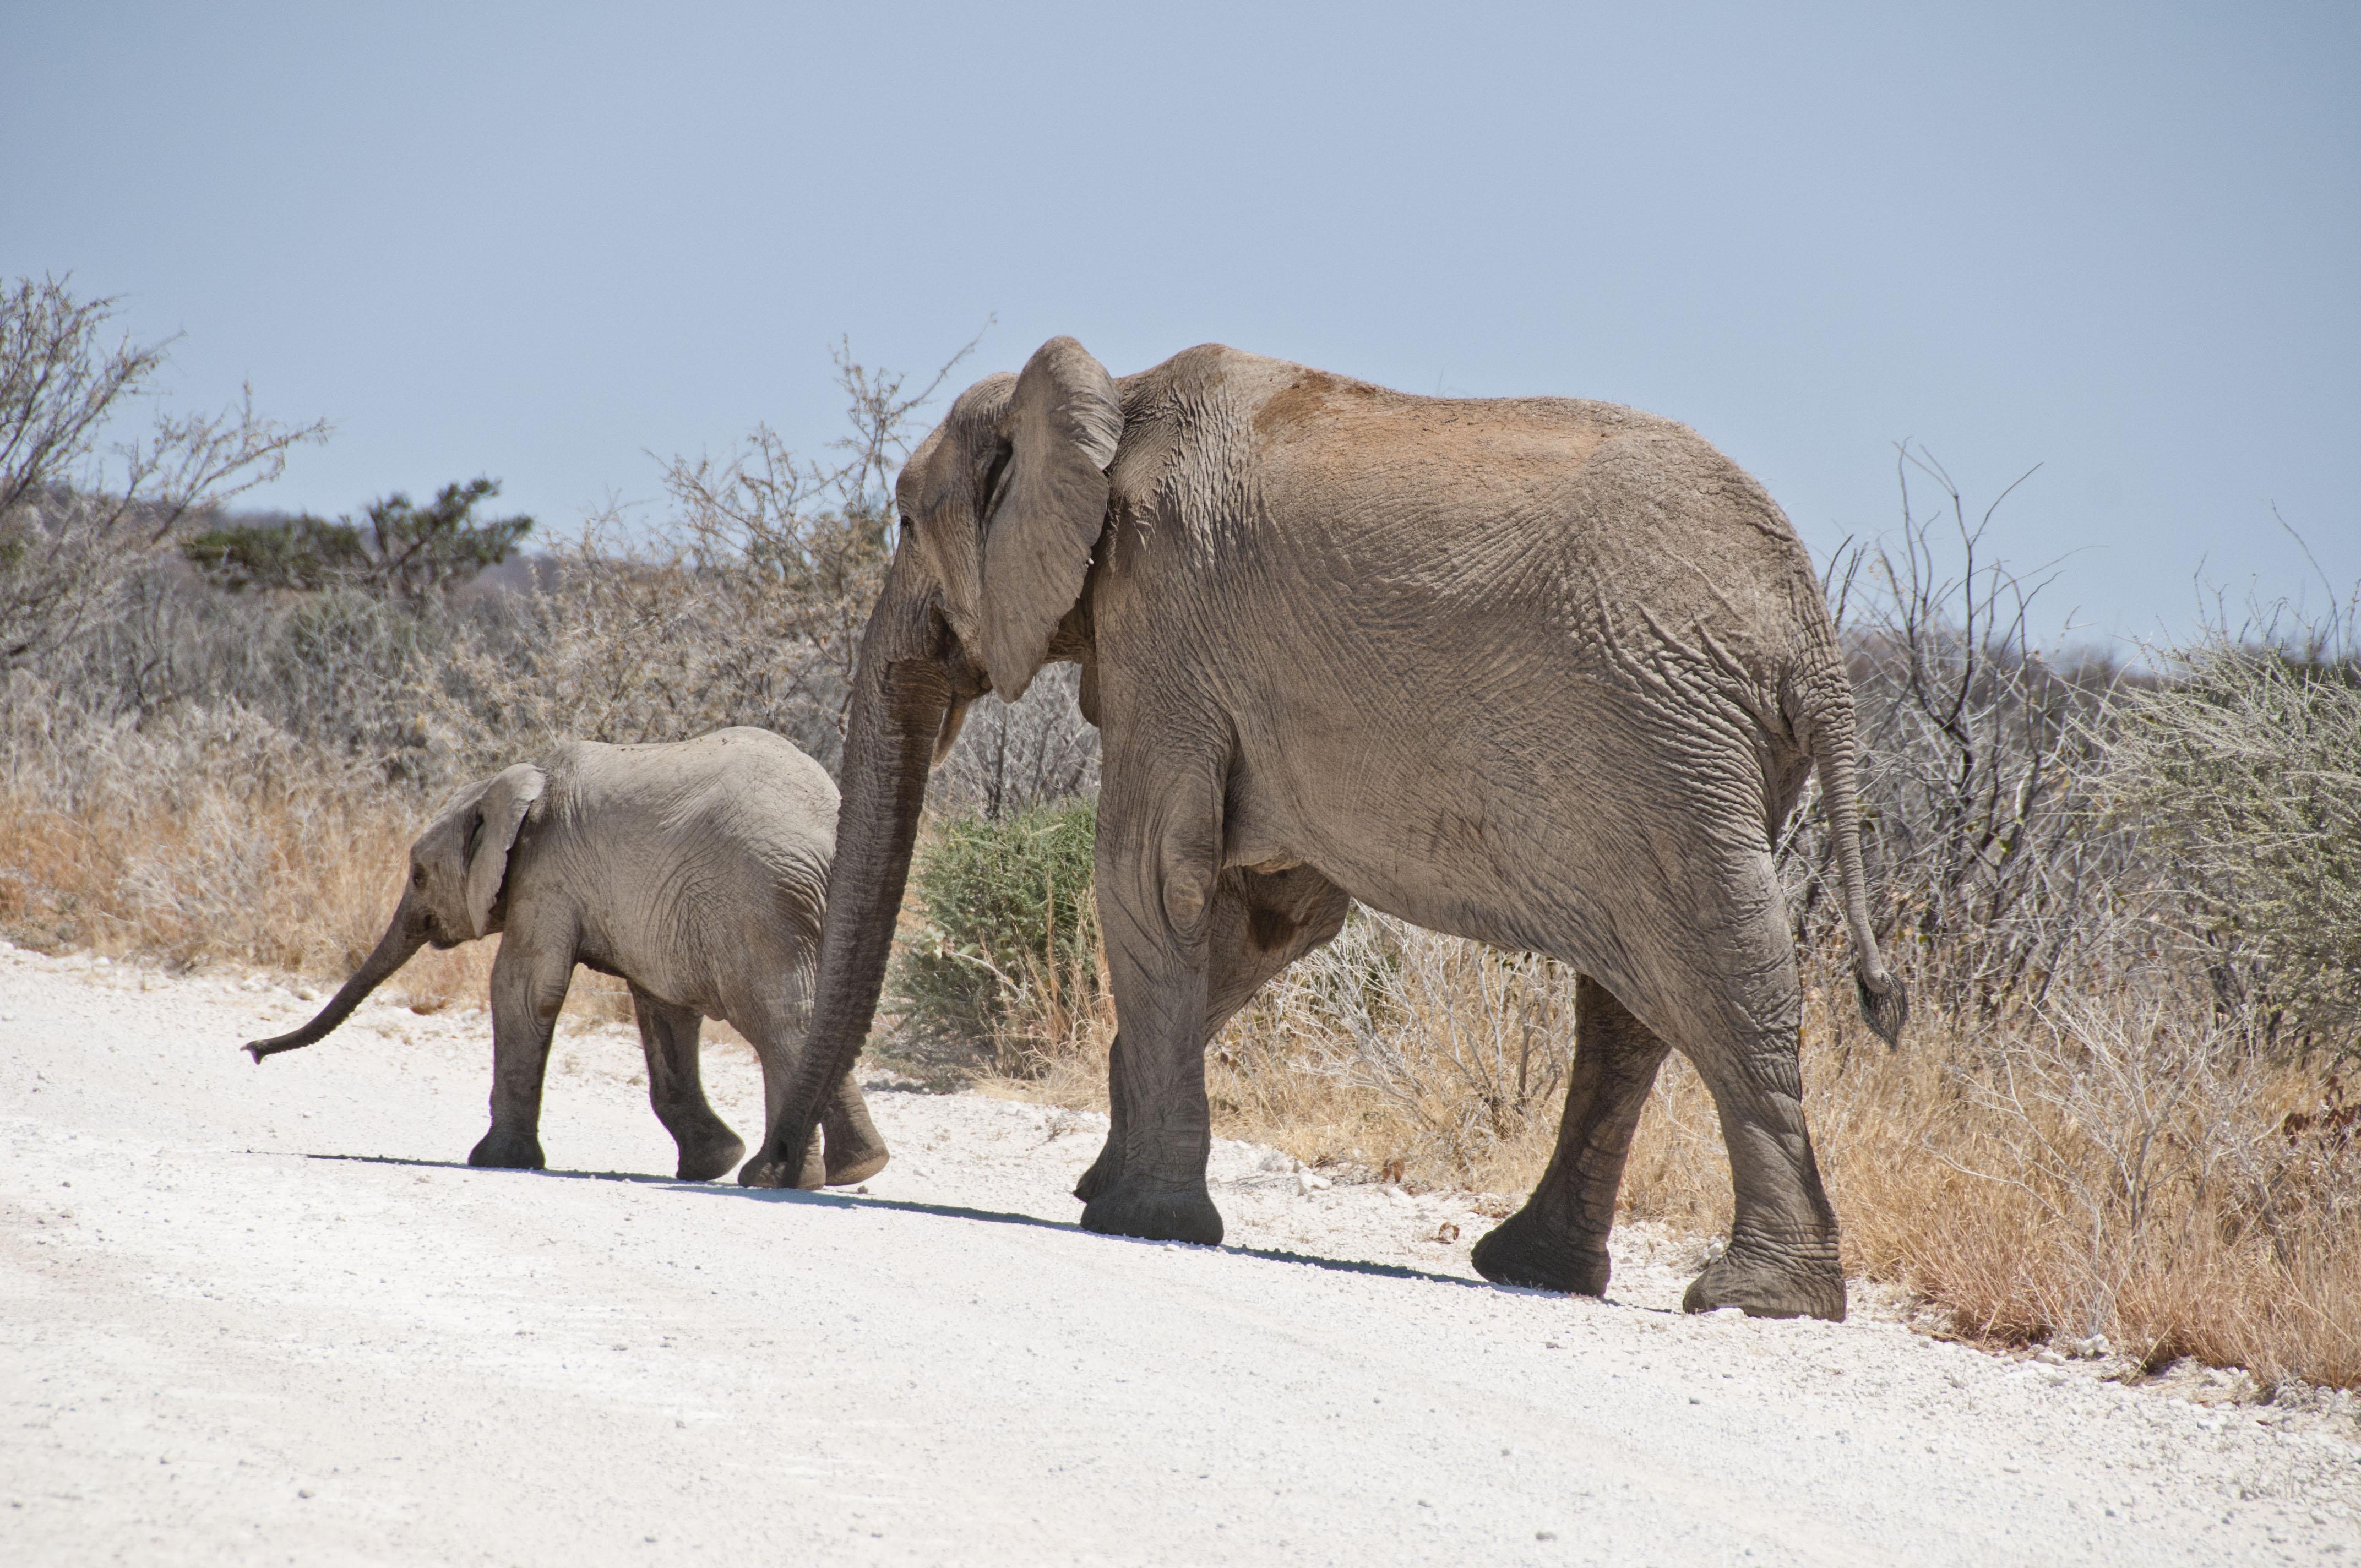 namibia_2014_kaokoveld-etoscha_063